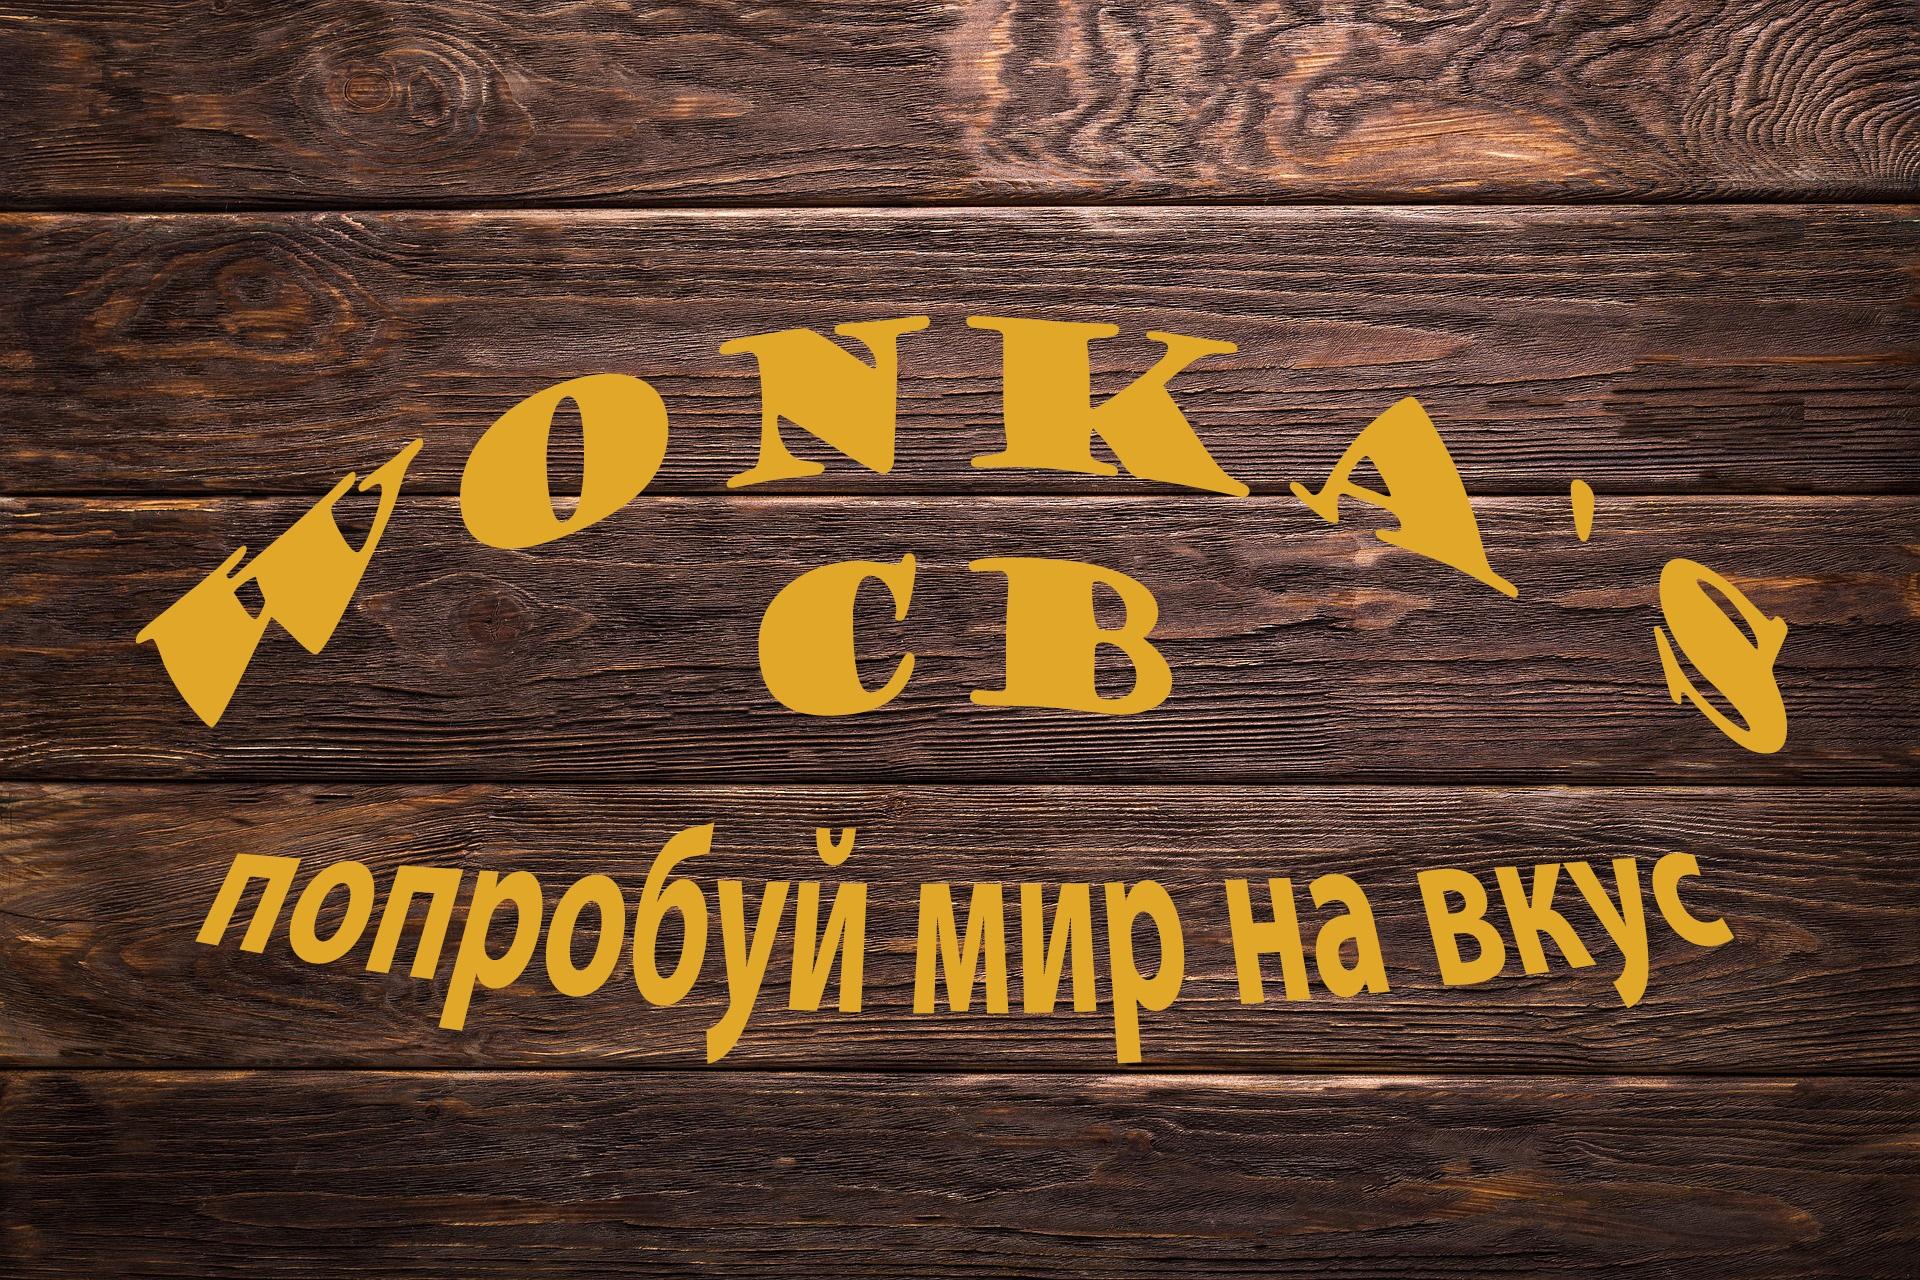 Разработка логотипа магазина сладостей со всего мира. фото f_9255a298a00a7053.jpg